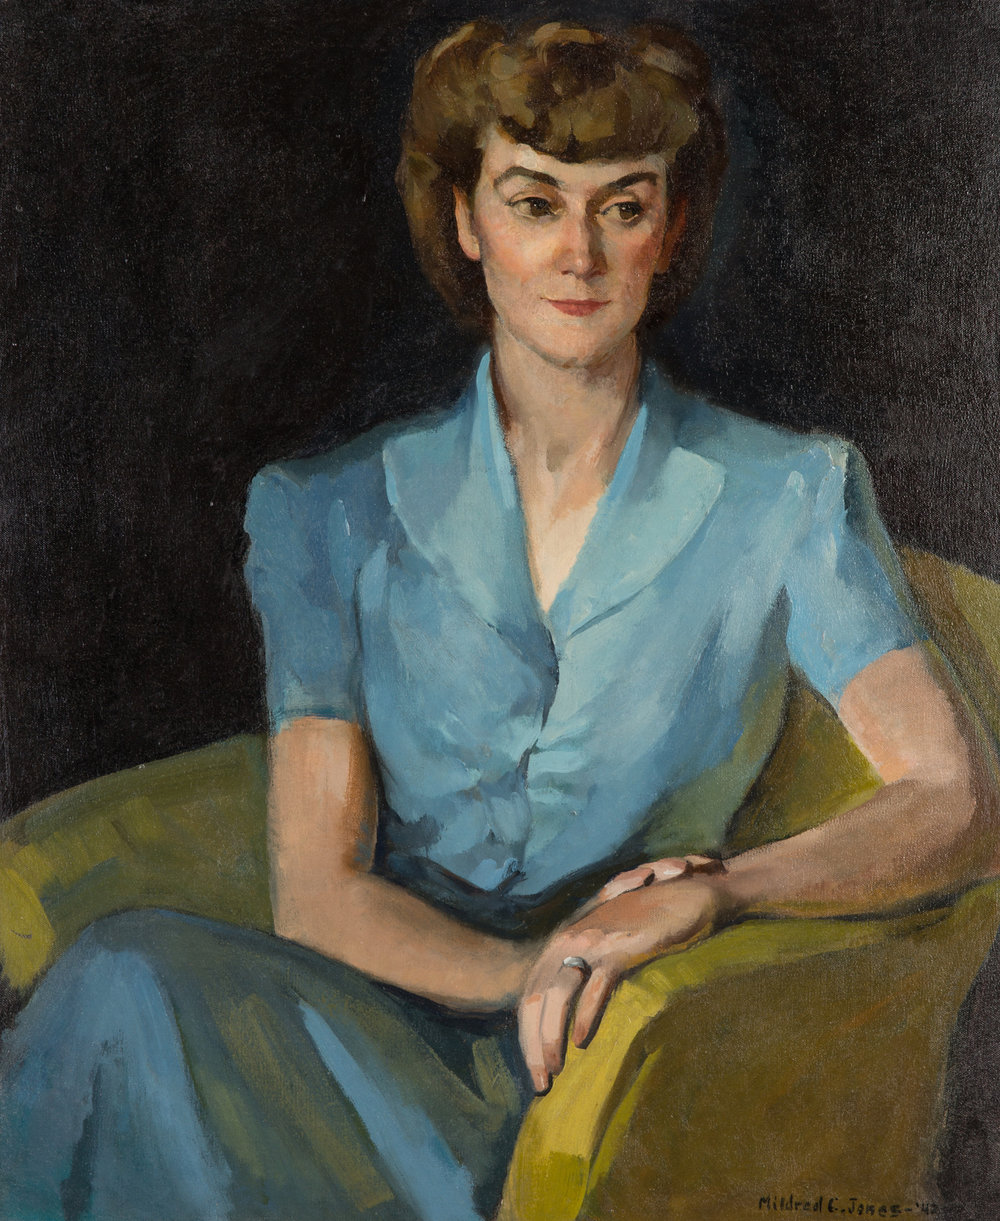 Mildred C. Jones: Self-portrait, 1942. Oil on canvas.